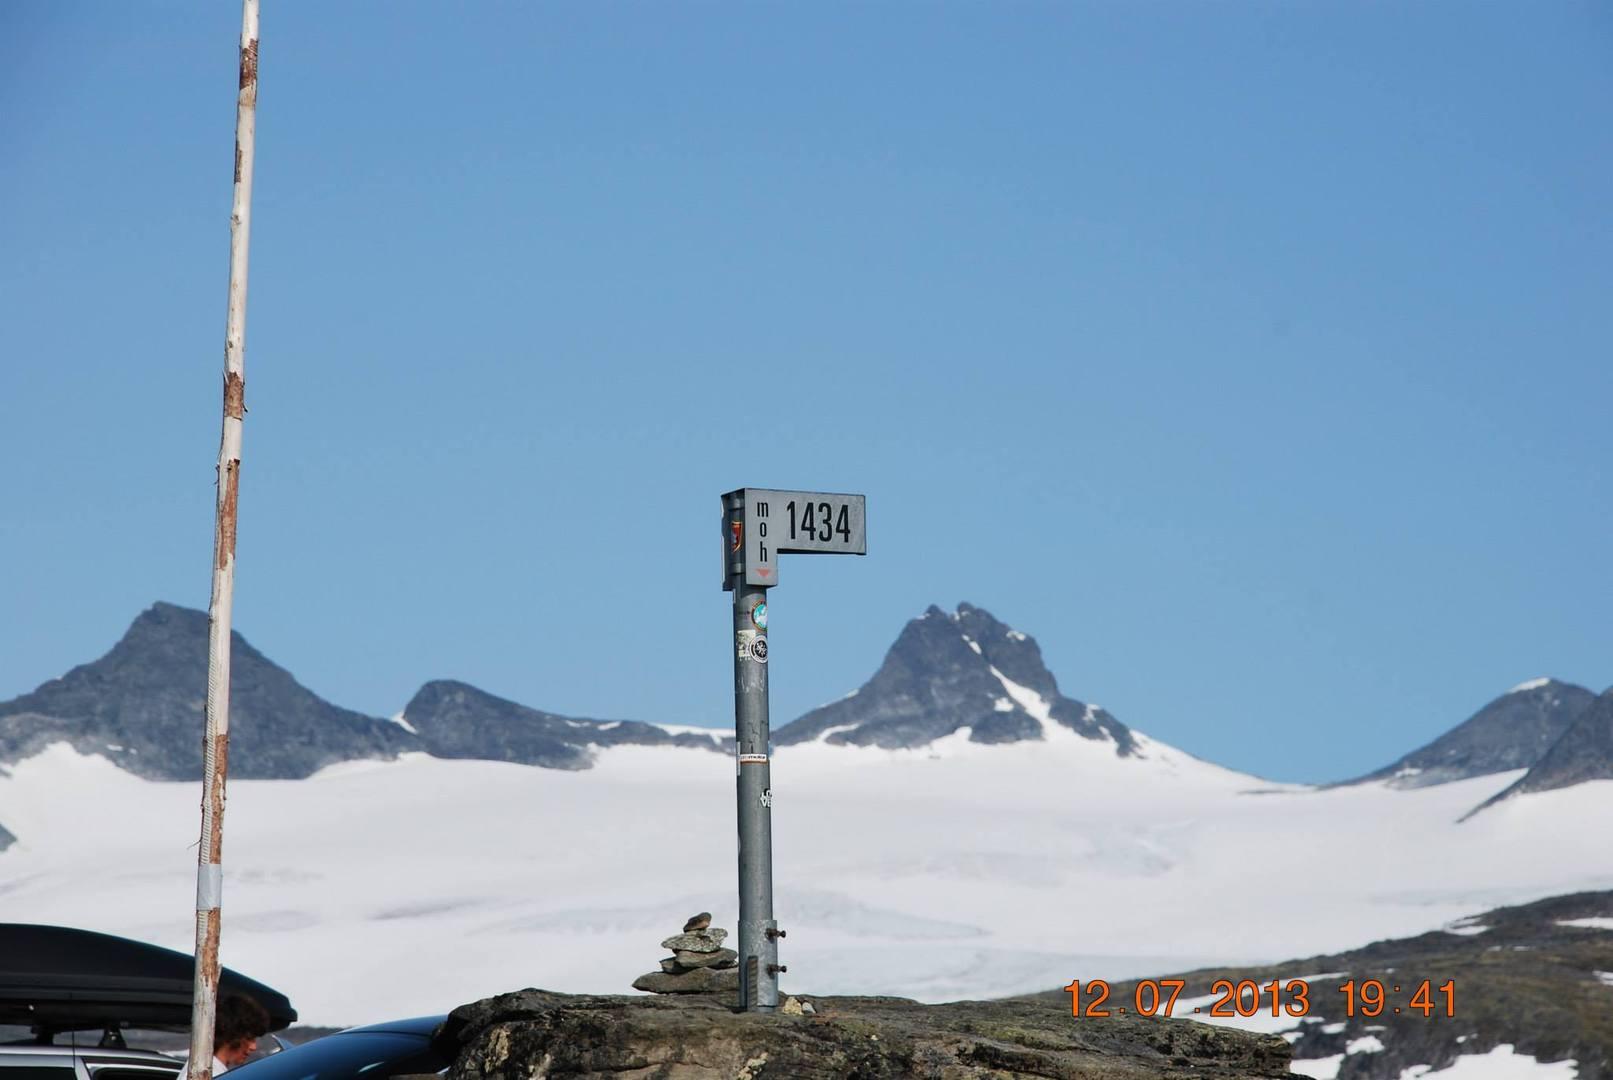 Fantesteín אשר נמצאת בגובה של 1434 מטר